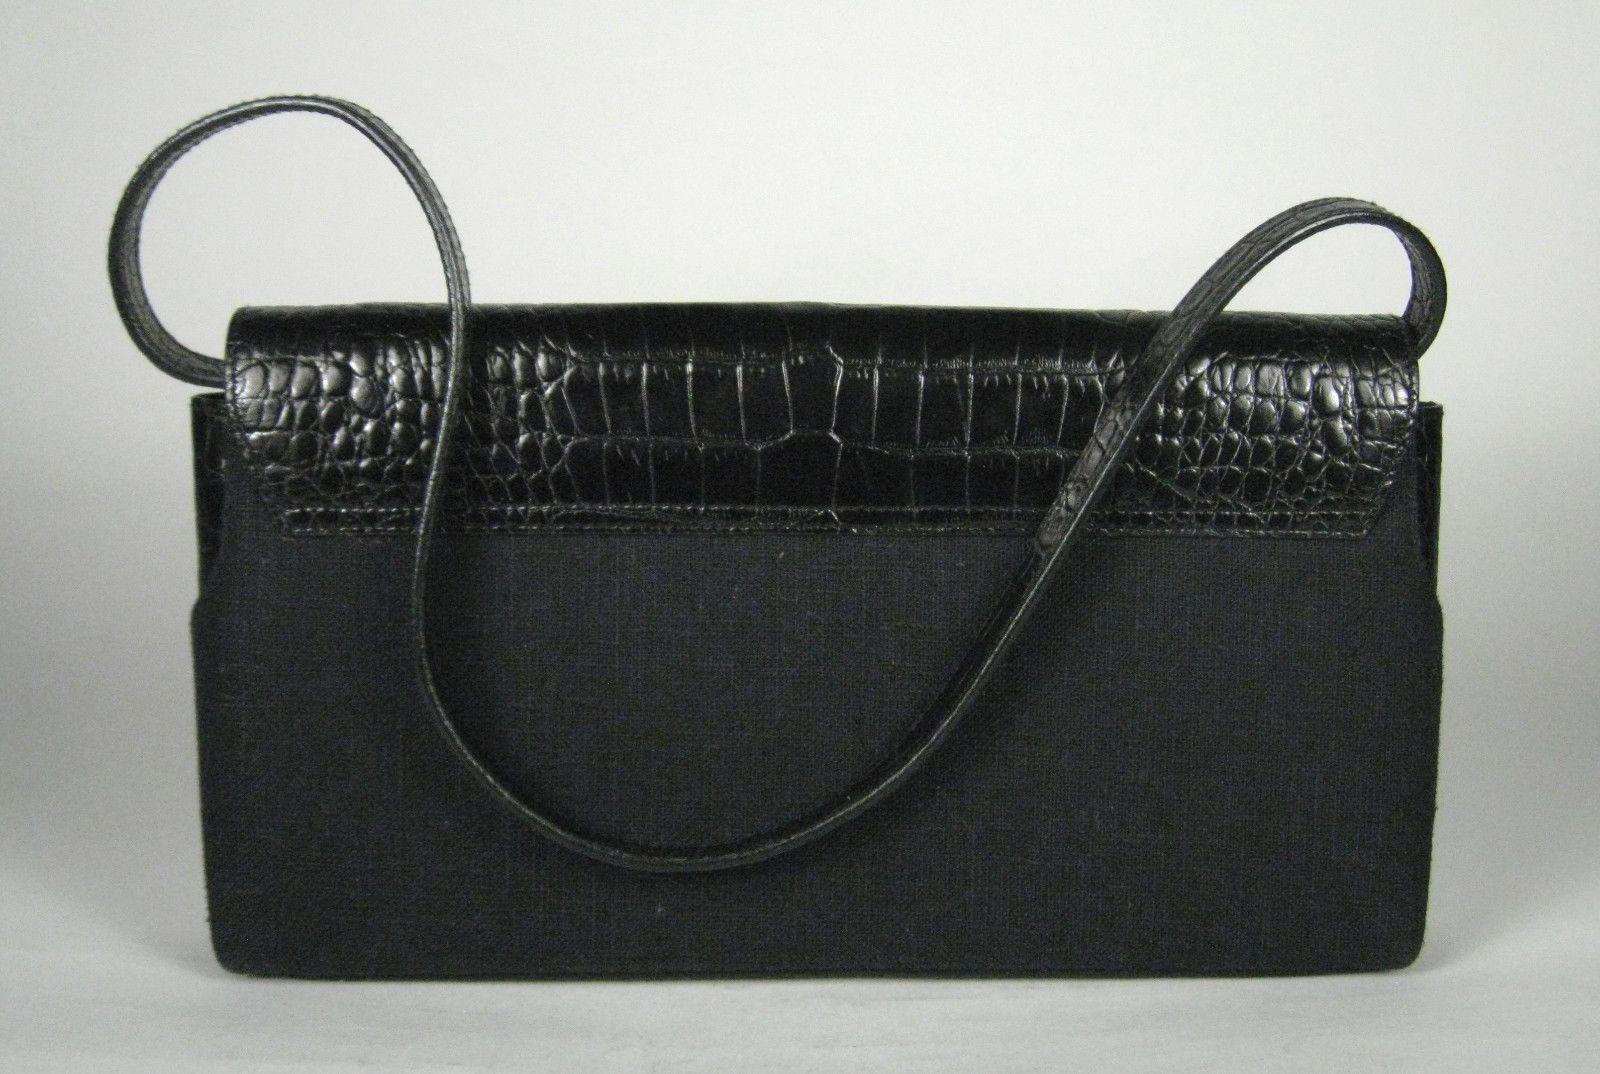 a8cab3ecac58 Lauren Ralph Lauren Bag Small Strap Handheld and 50 similar items